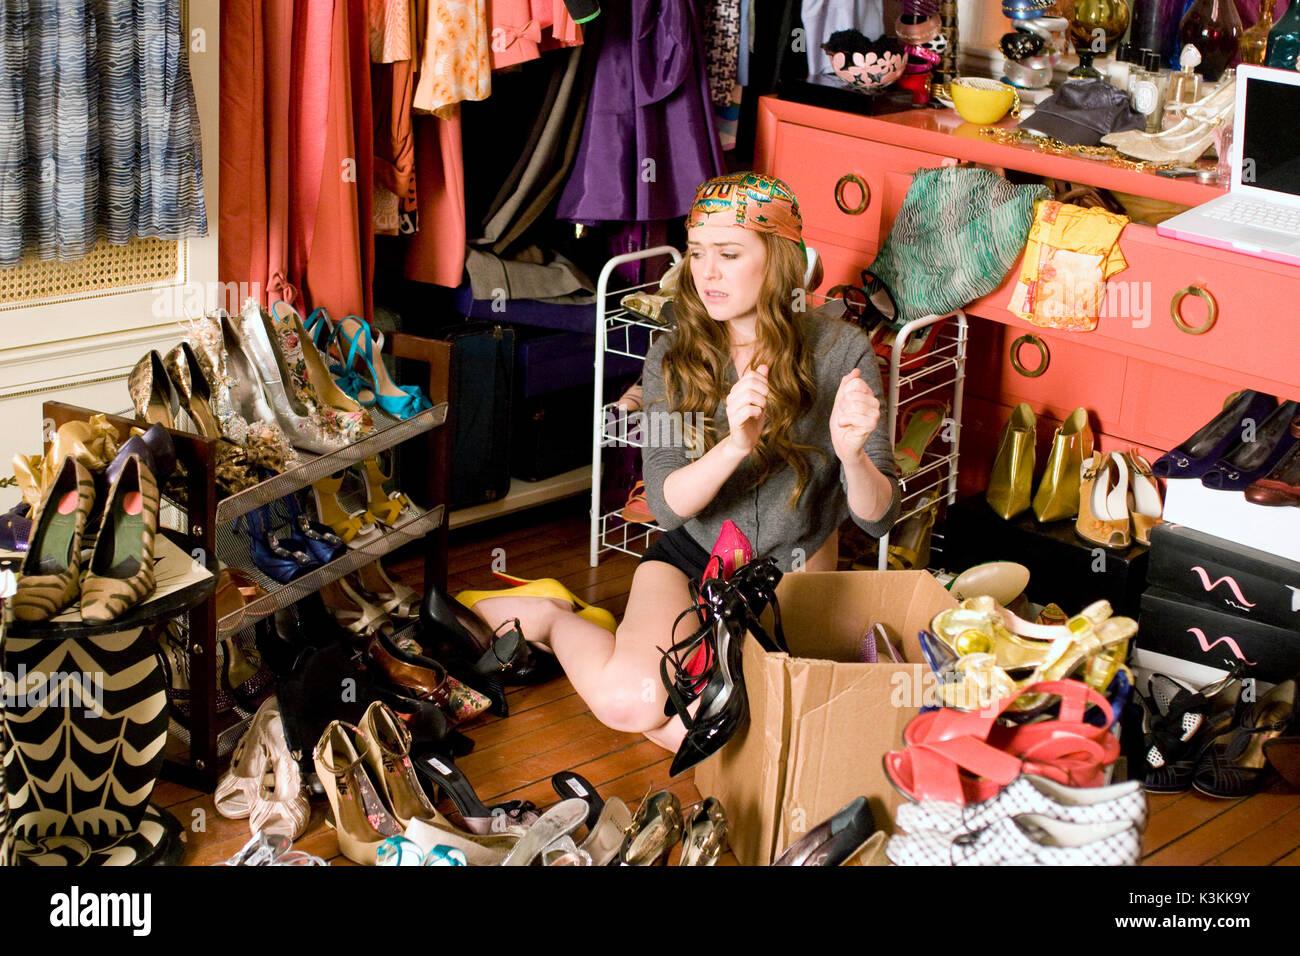 dating a shopaholic